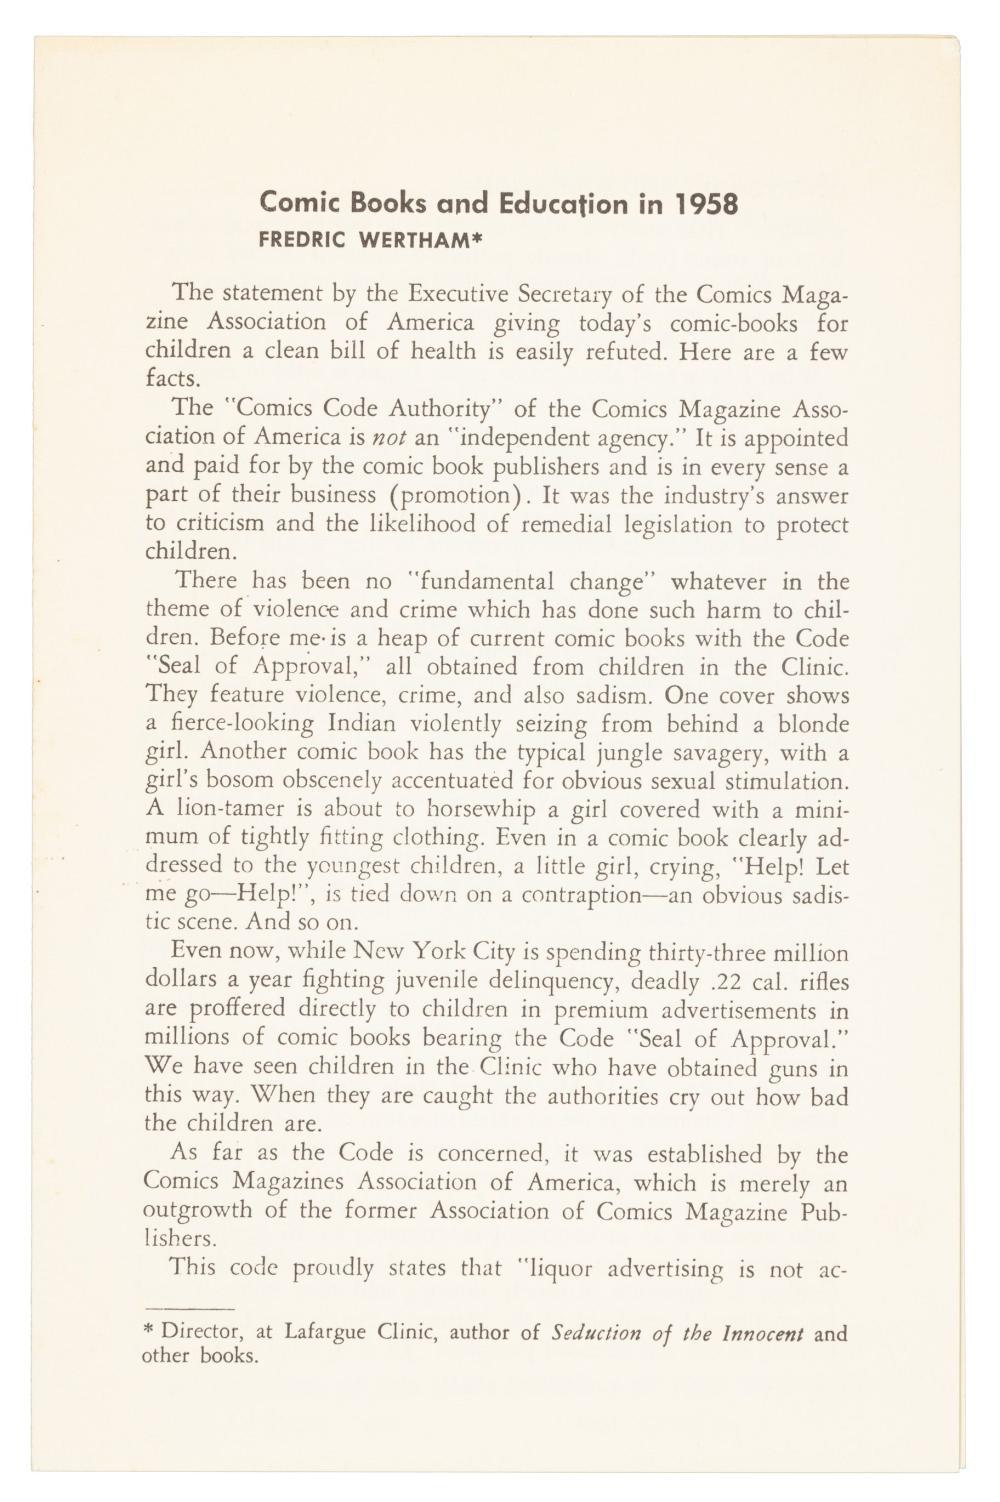 WERTHAM'S Comic Books & Education in 1958 * Rare Pamphet